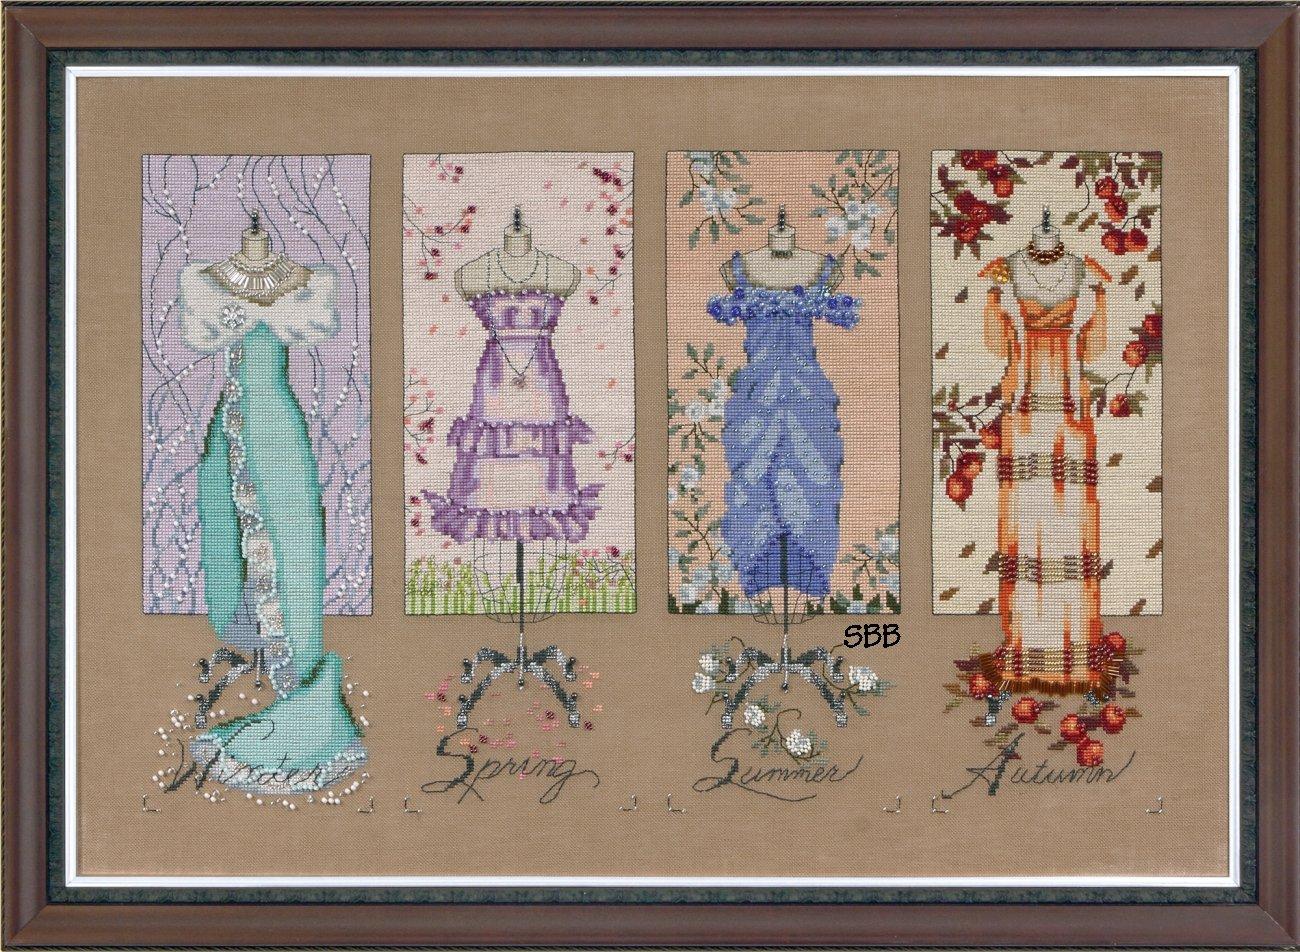 Mirabilia  #MD121 Dressmaker's Daughter